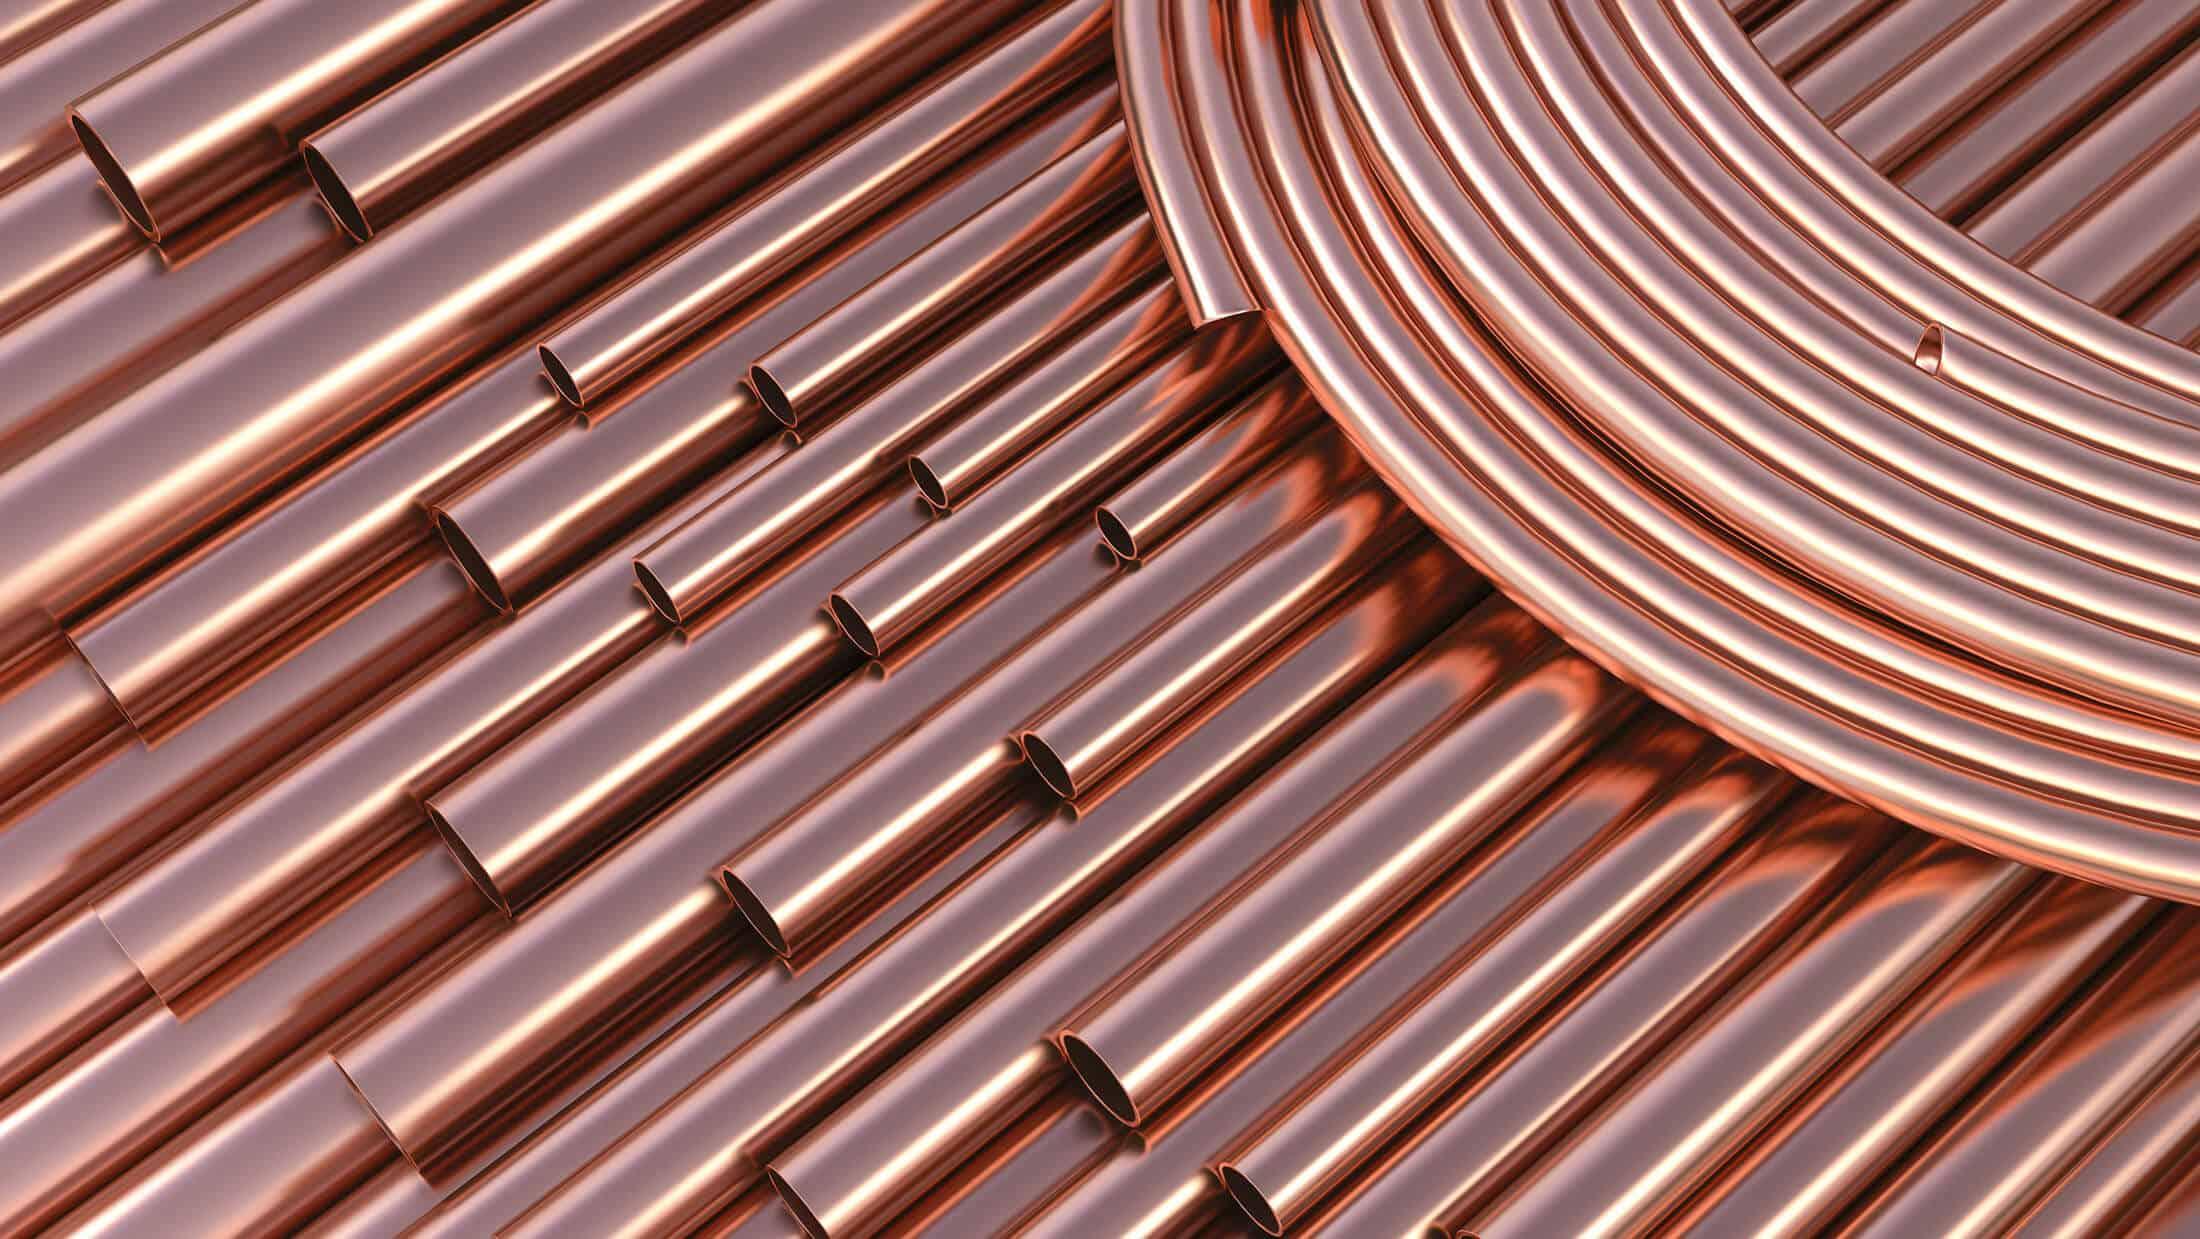 15mm copper pipe & 22mm copper Pipe